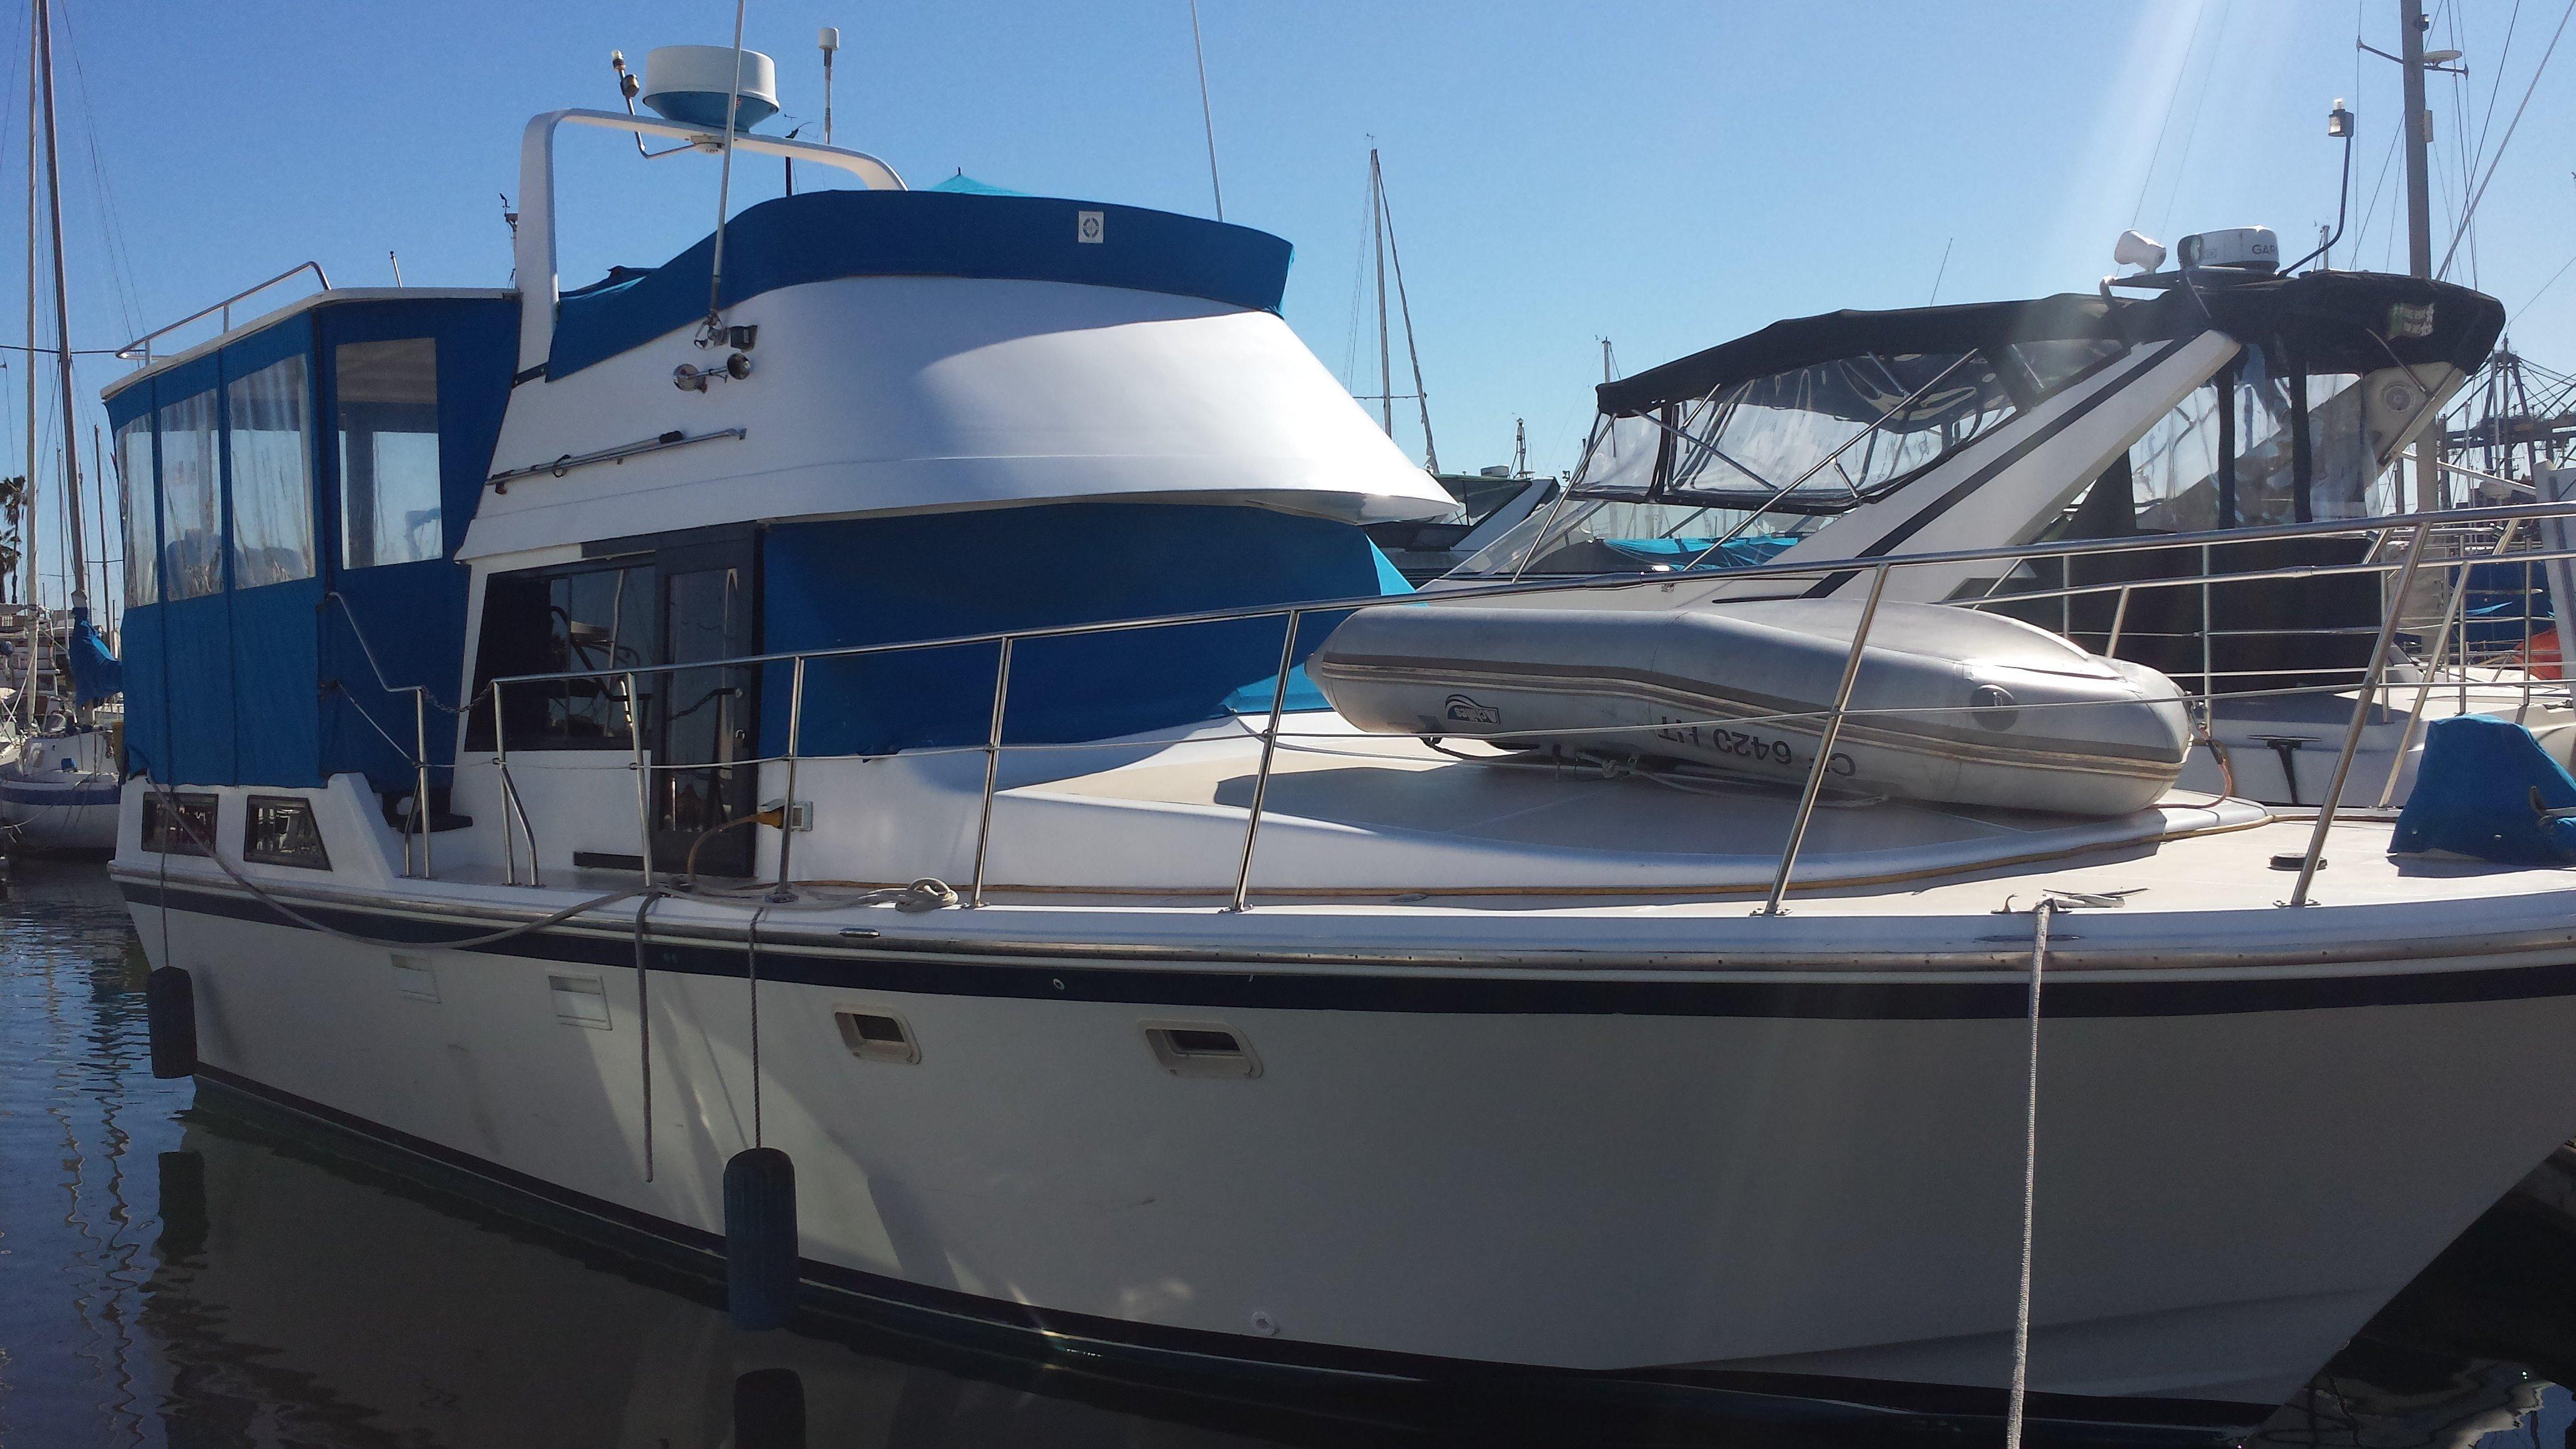 Boat Charters Long Beach Ca